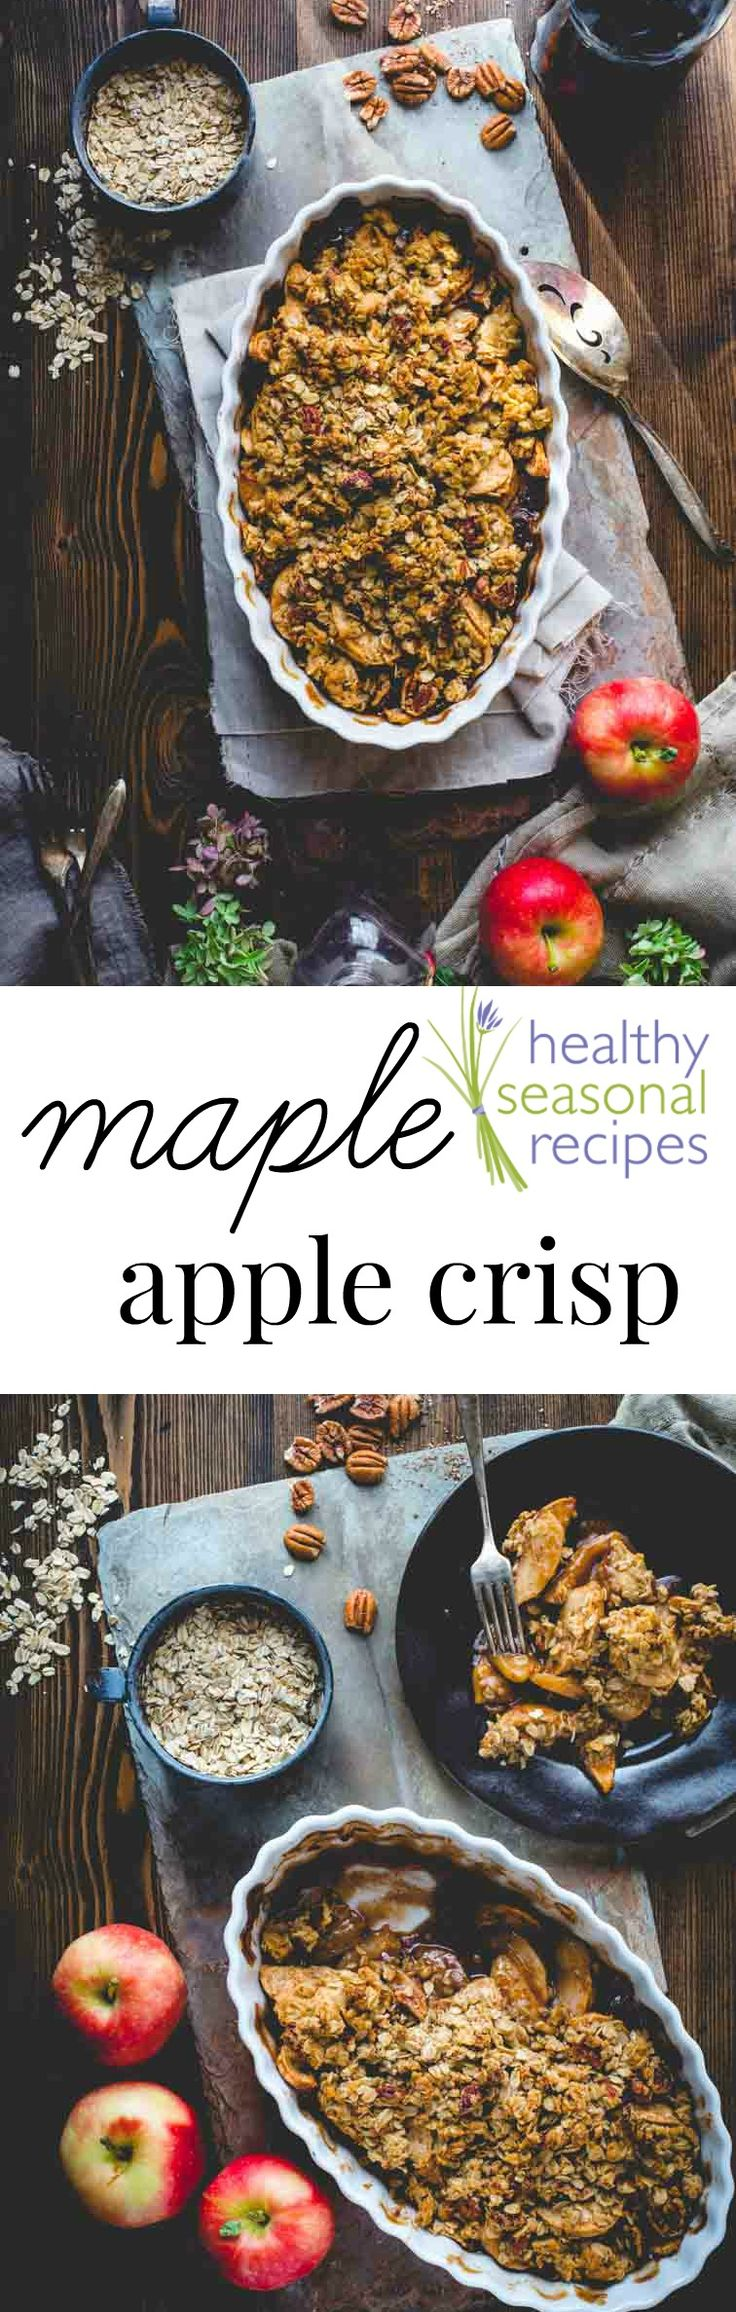 maple apple crisp - Healthy Seasonal Recipes